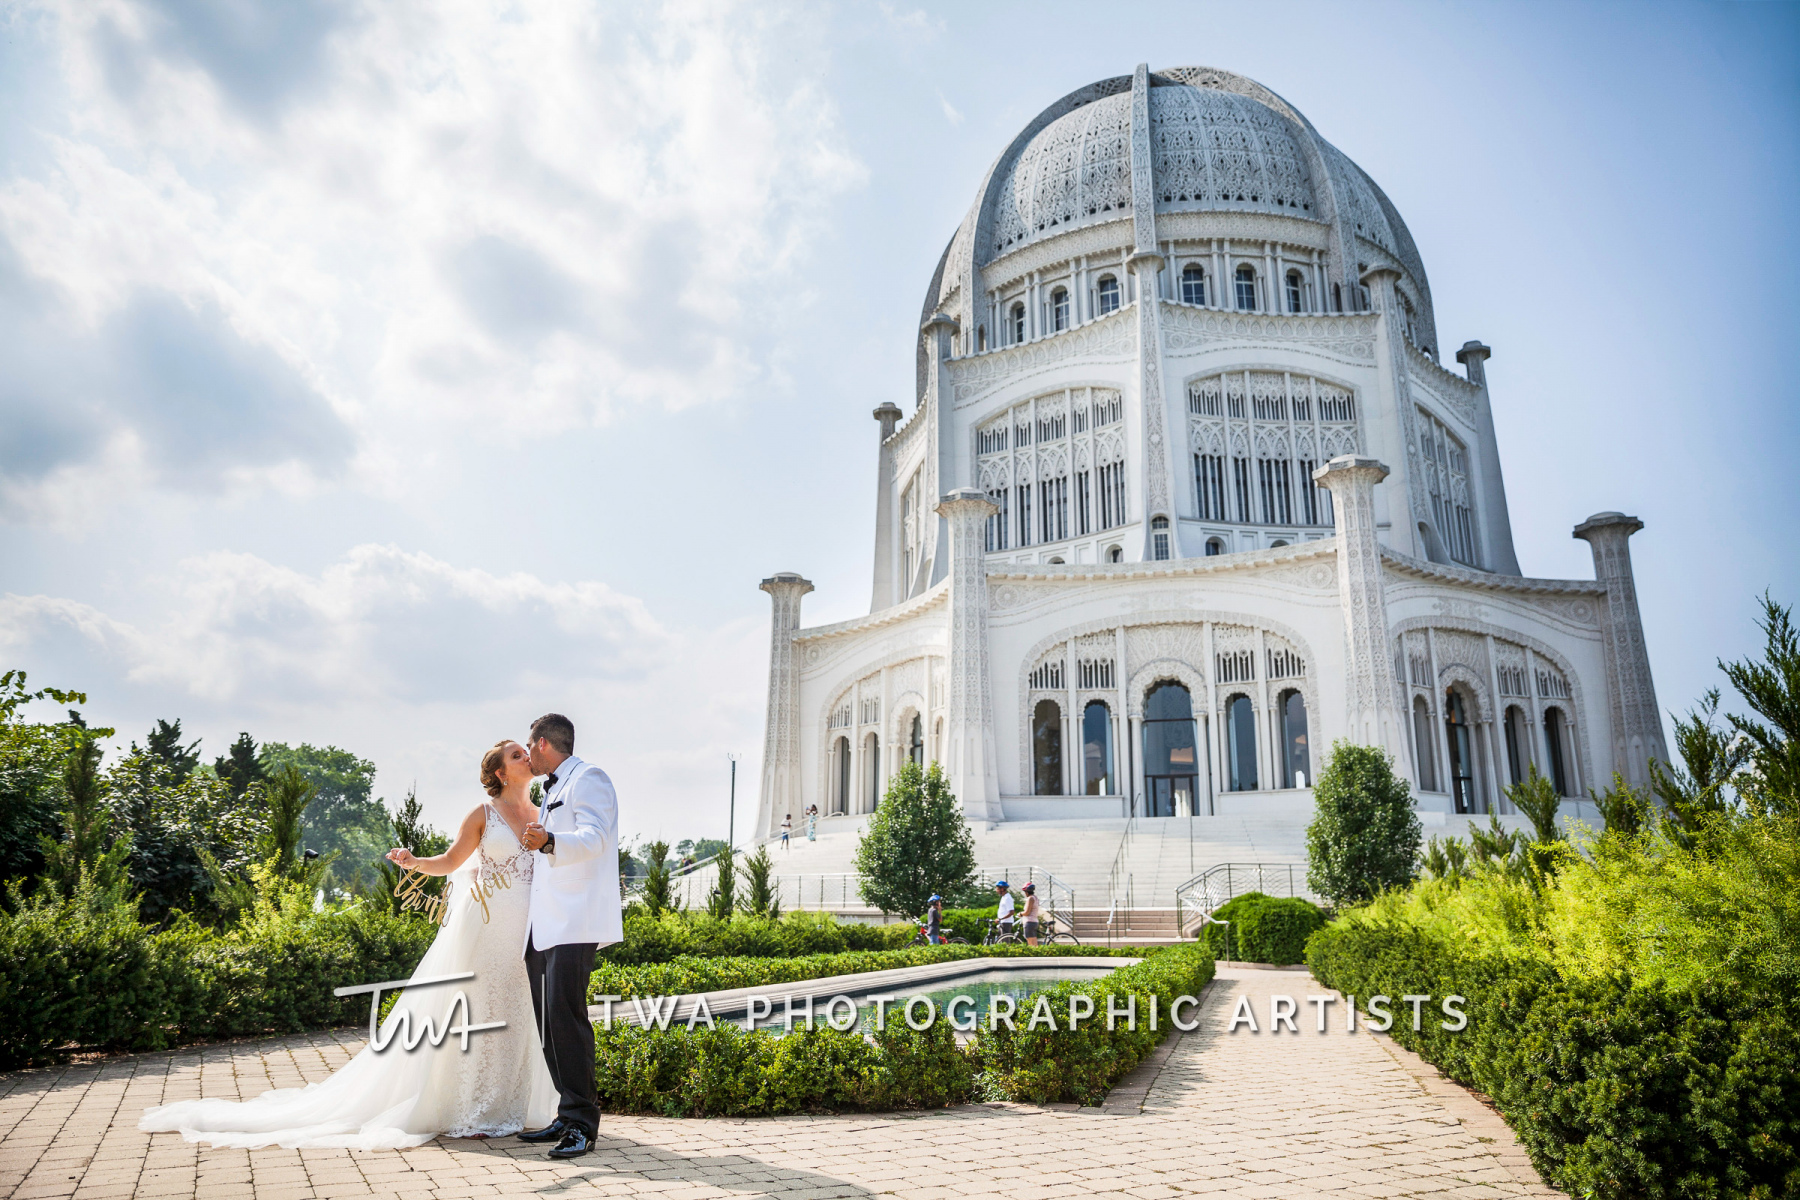 Chicago-Wedding-Photographers-Renaissance-Hotel_Hohensee_Fleishman_JG_DK-041-1242